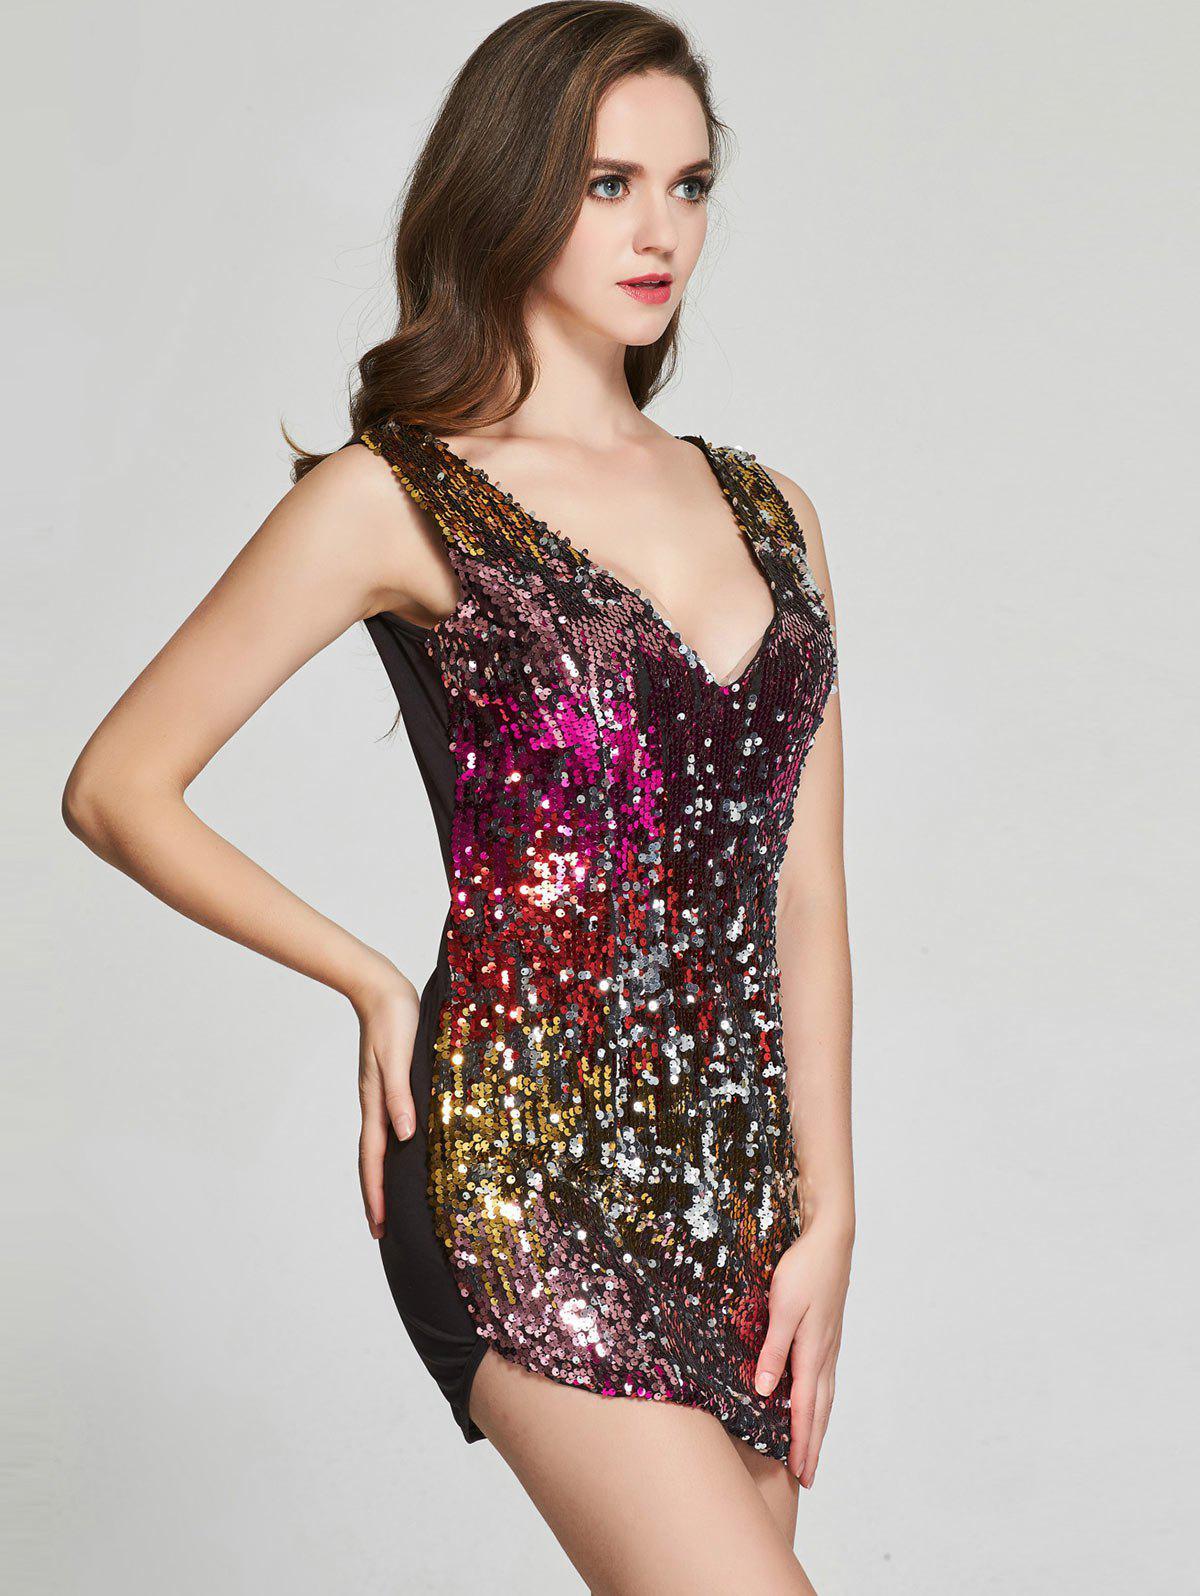 Sequin Glitter Sparkly Tight Club Mini Short Dress 210217206